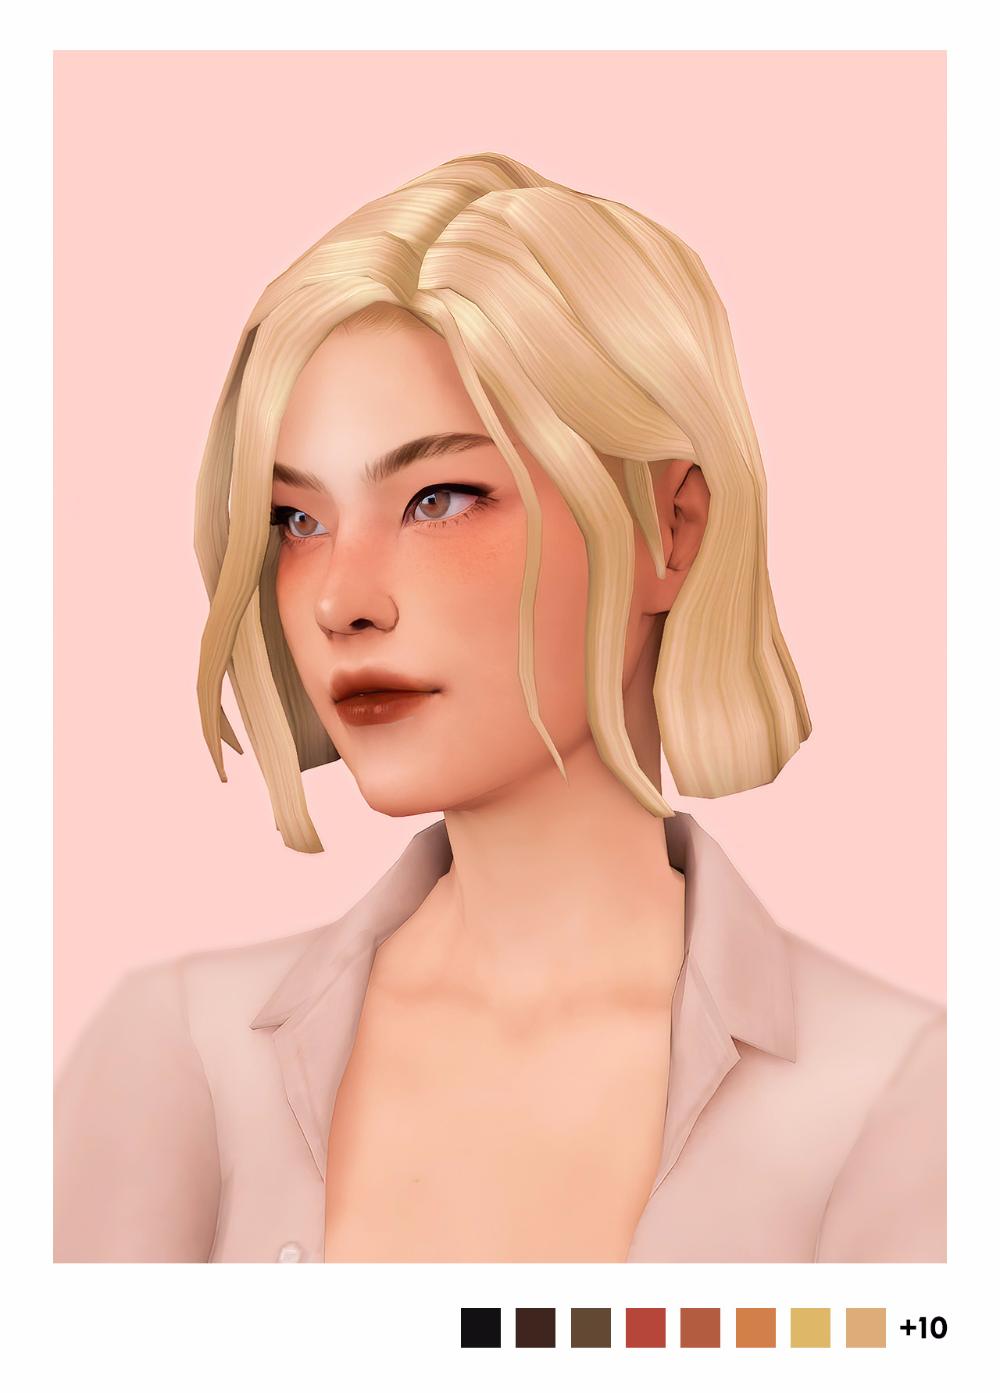 Sulsulhun S Jade Hair The Sims 4 V 2020 G Zhenskie Pricheski Pricheski Sims 4